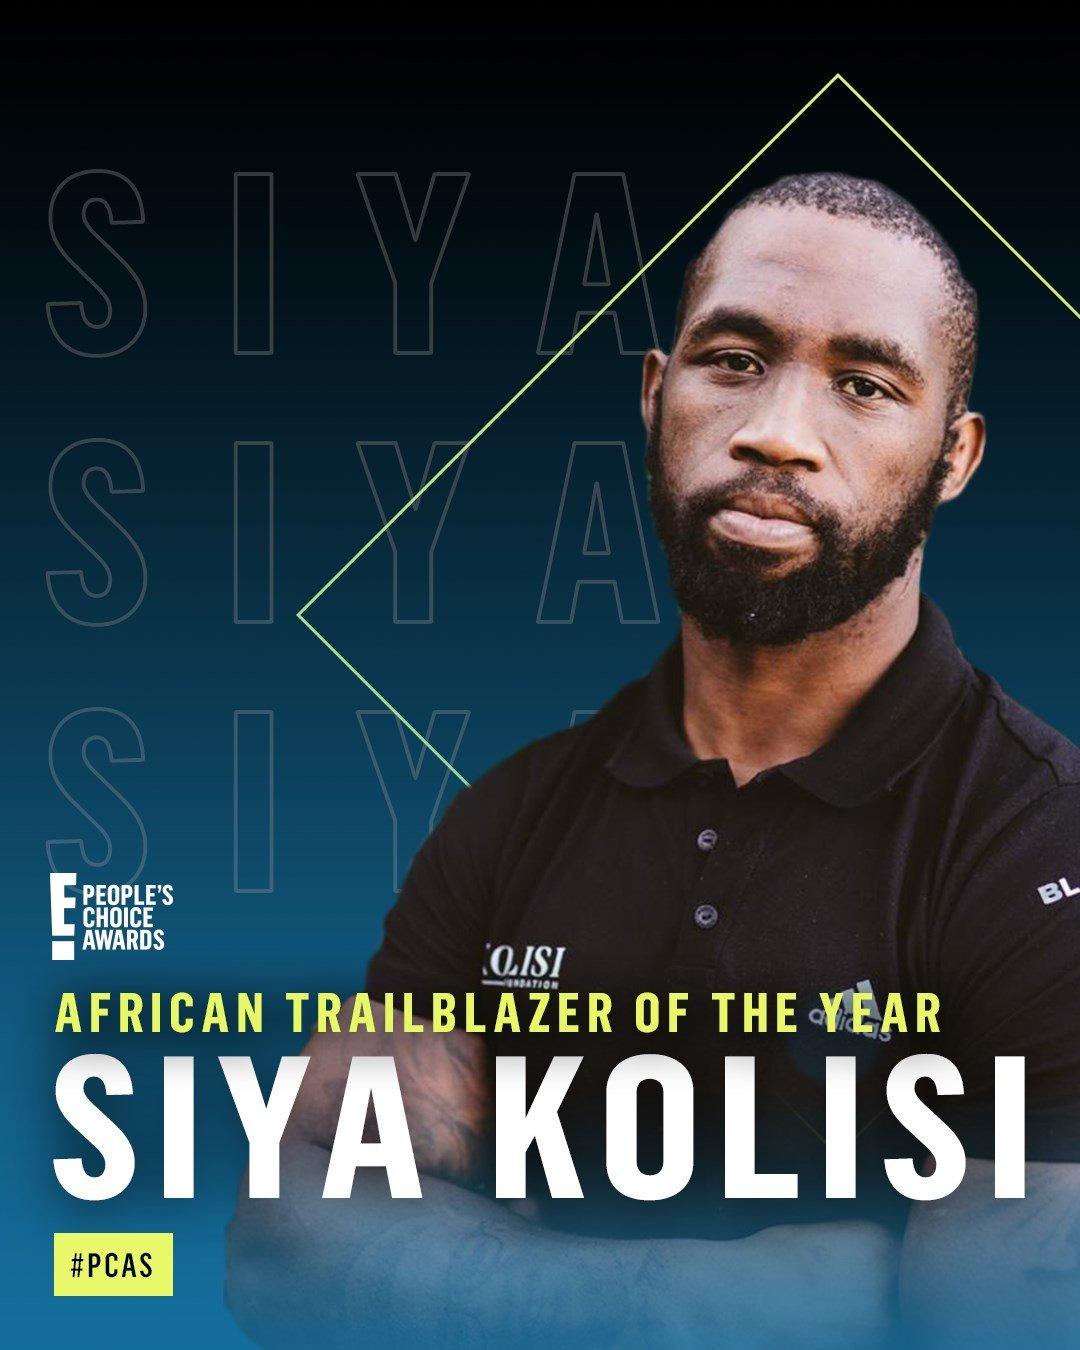 Siya Kolisi named African Trailblazer of the Year at 2020 E! People's Choice Awards